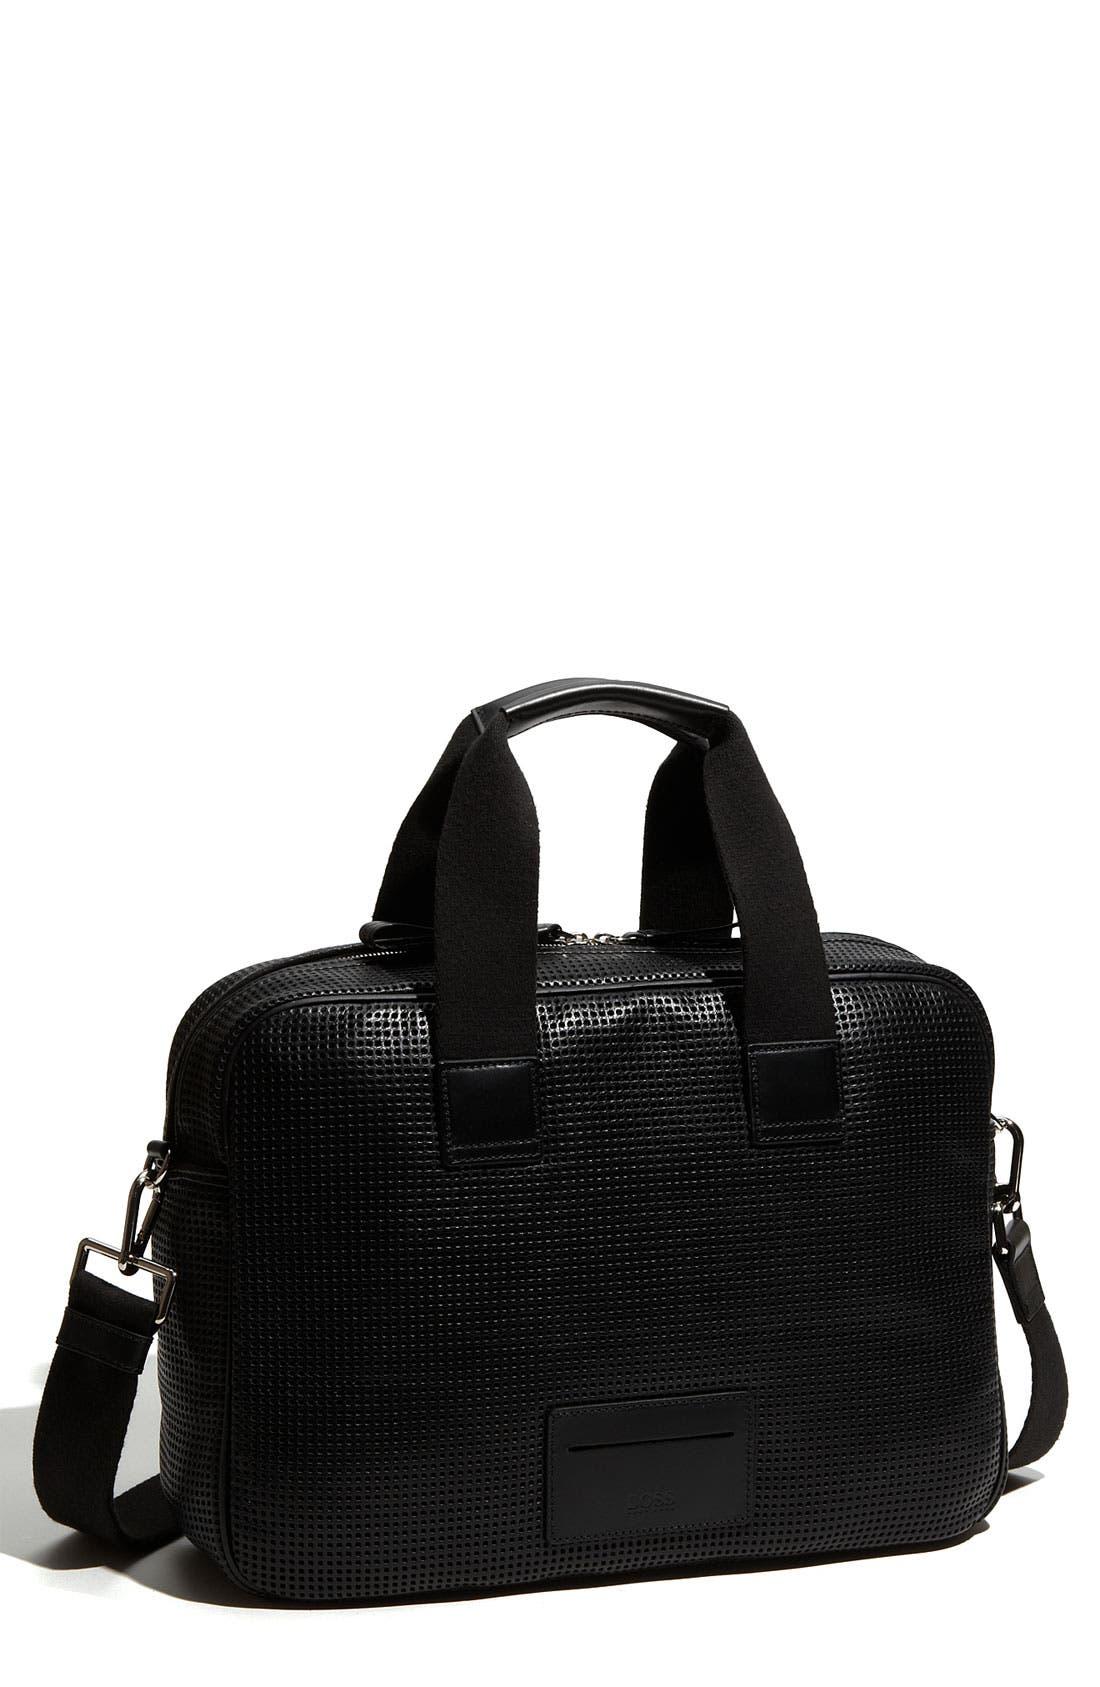 BOSS Hugo Boss 'Polka' Leather Briefcase, Main, color, 001